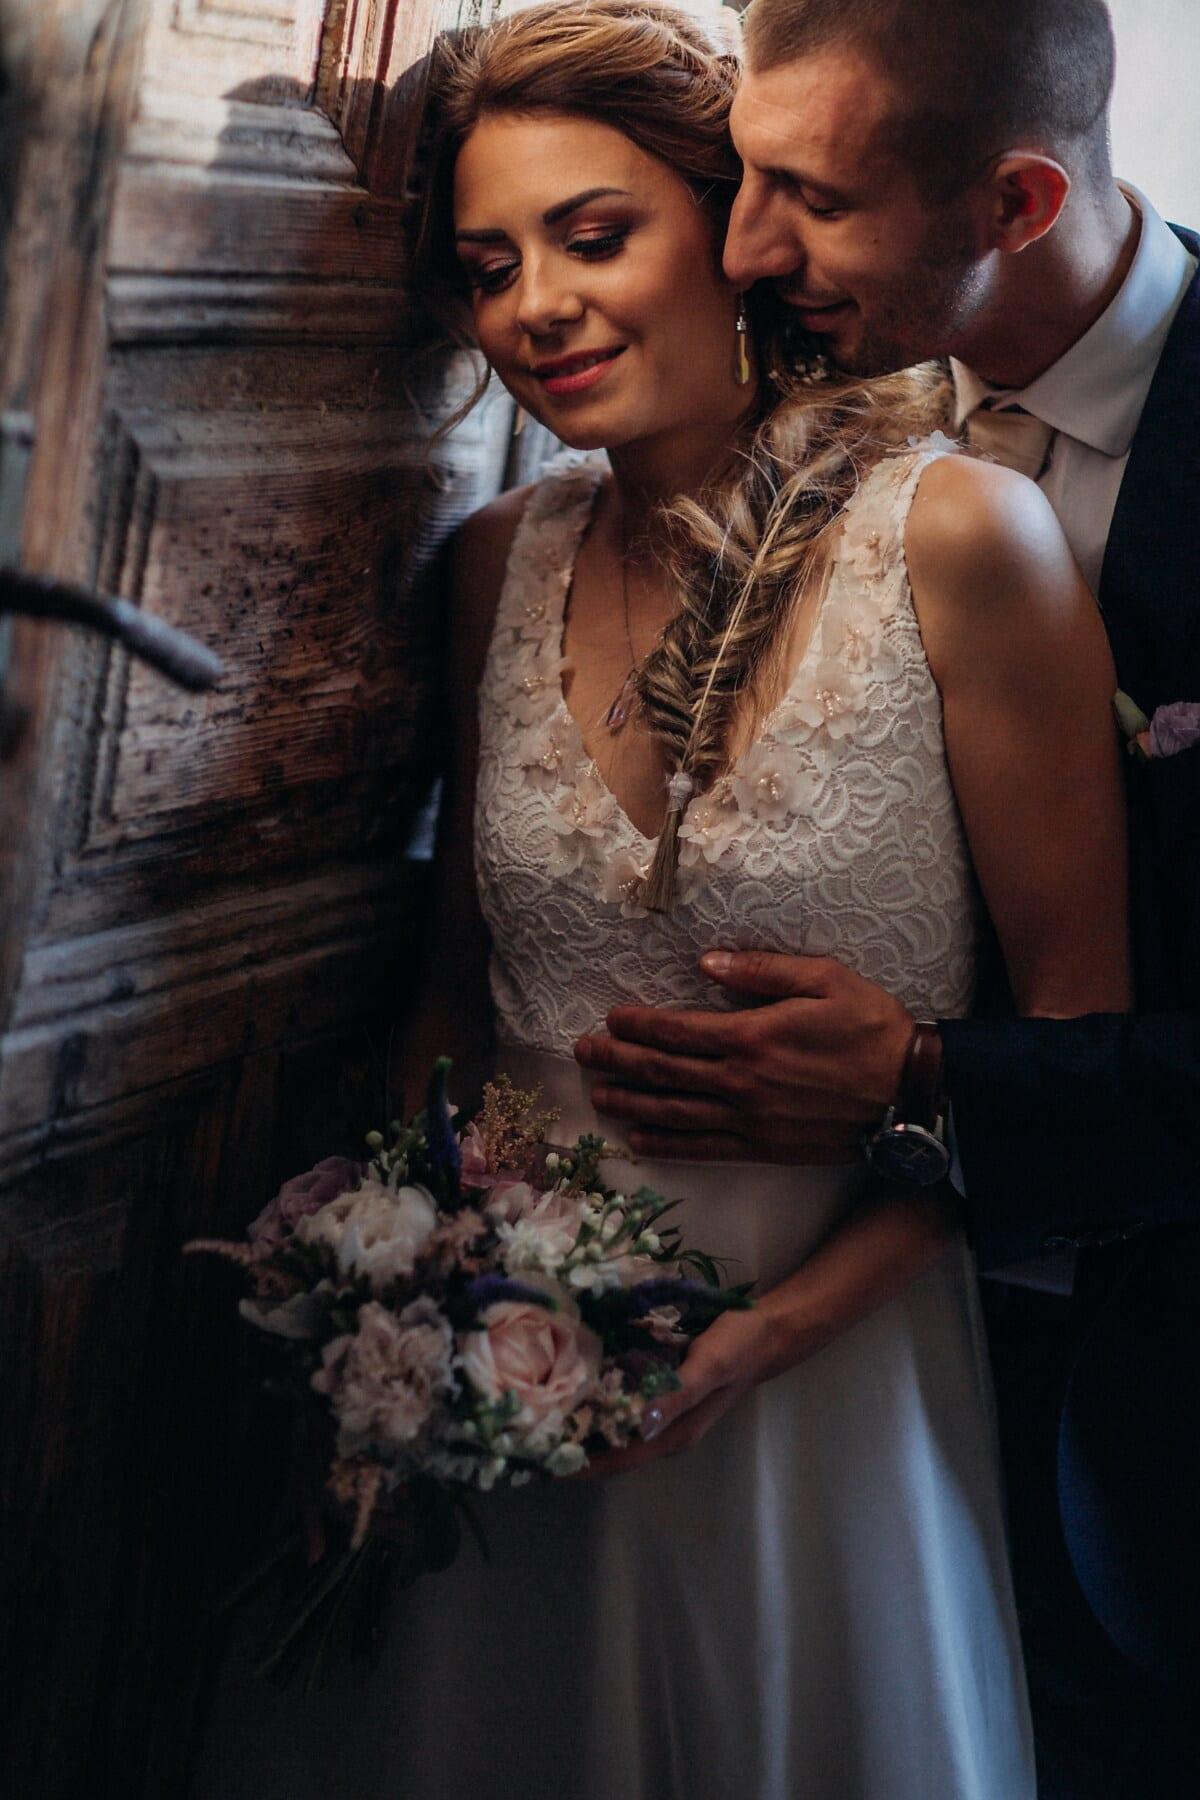 gentleman, neck, kiss, face, pretty girl, gorgeous, bride, bouquet, dress, people